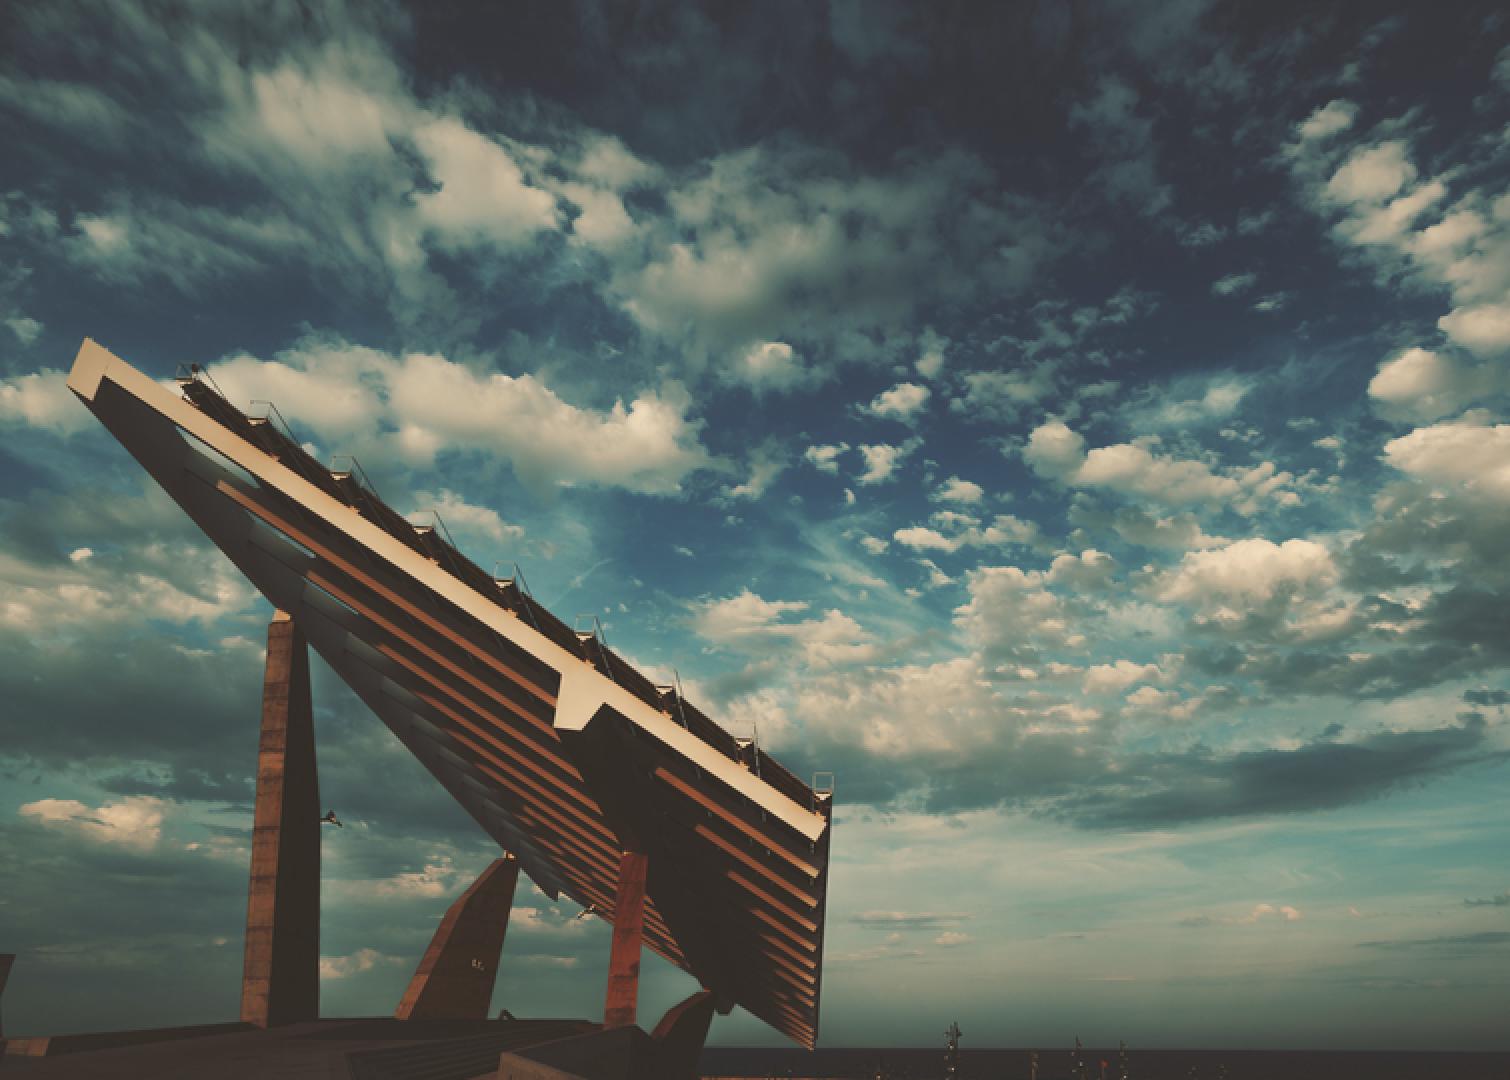 California's Wholesale Distributed Solar Program Is in Trouble. Will Regulators Finally Fix It?